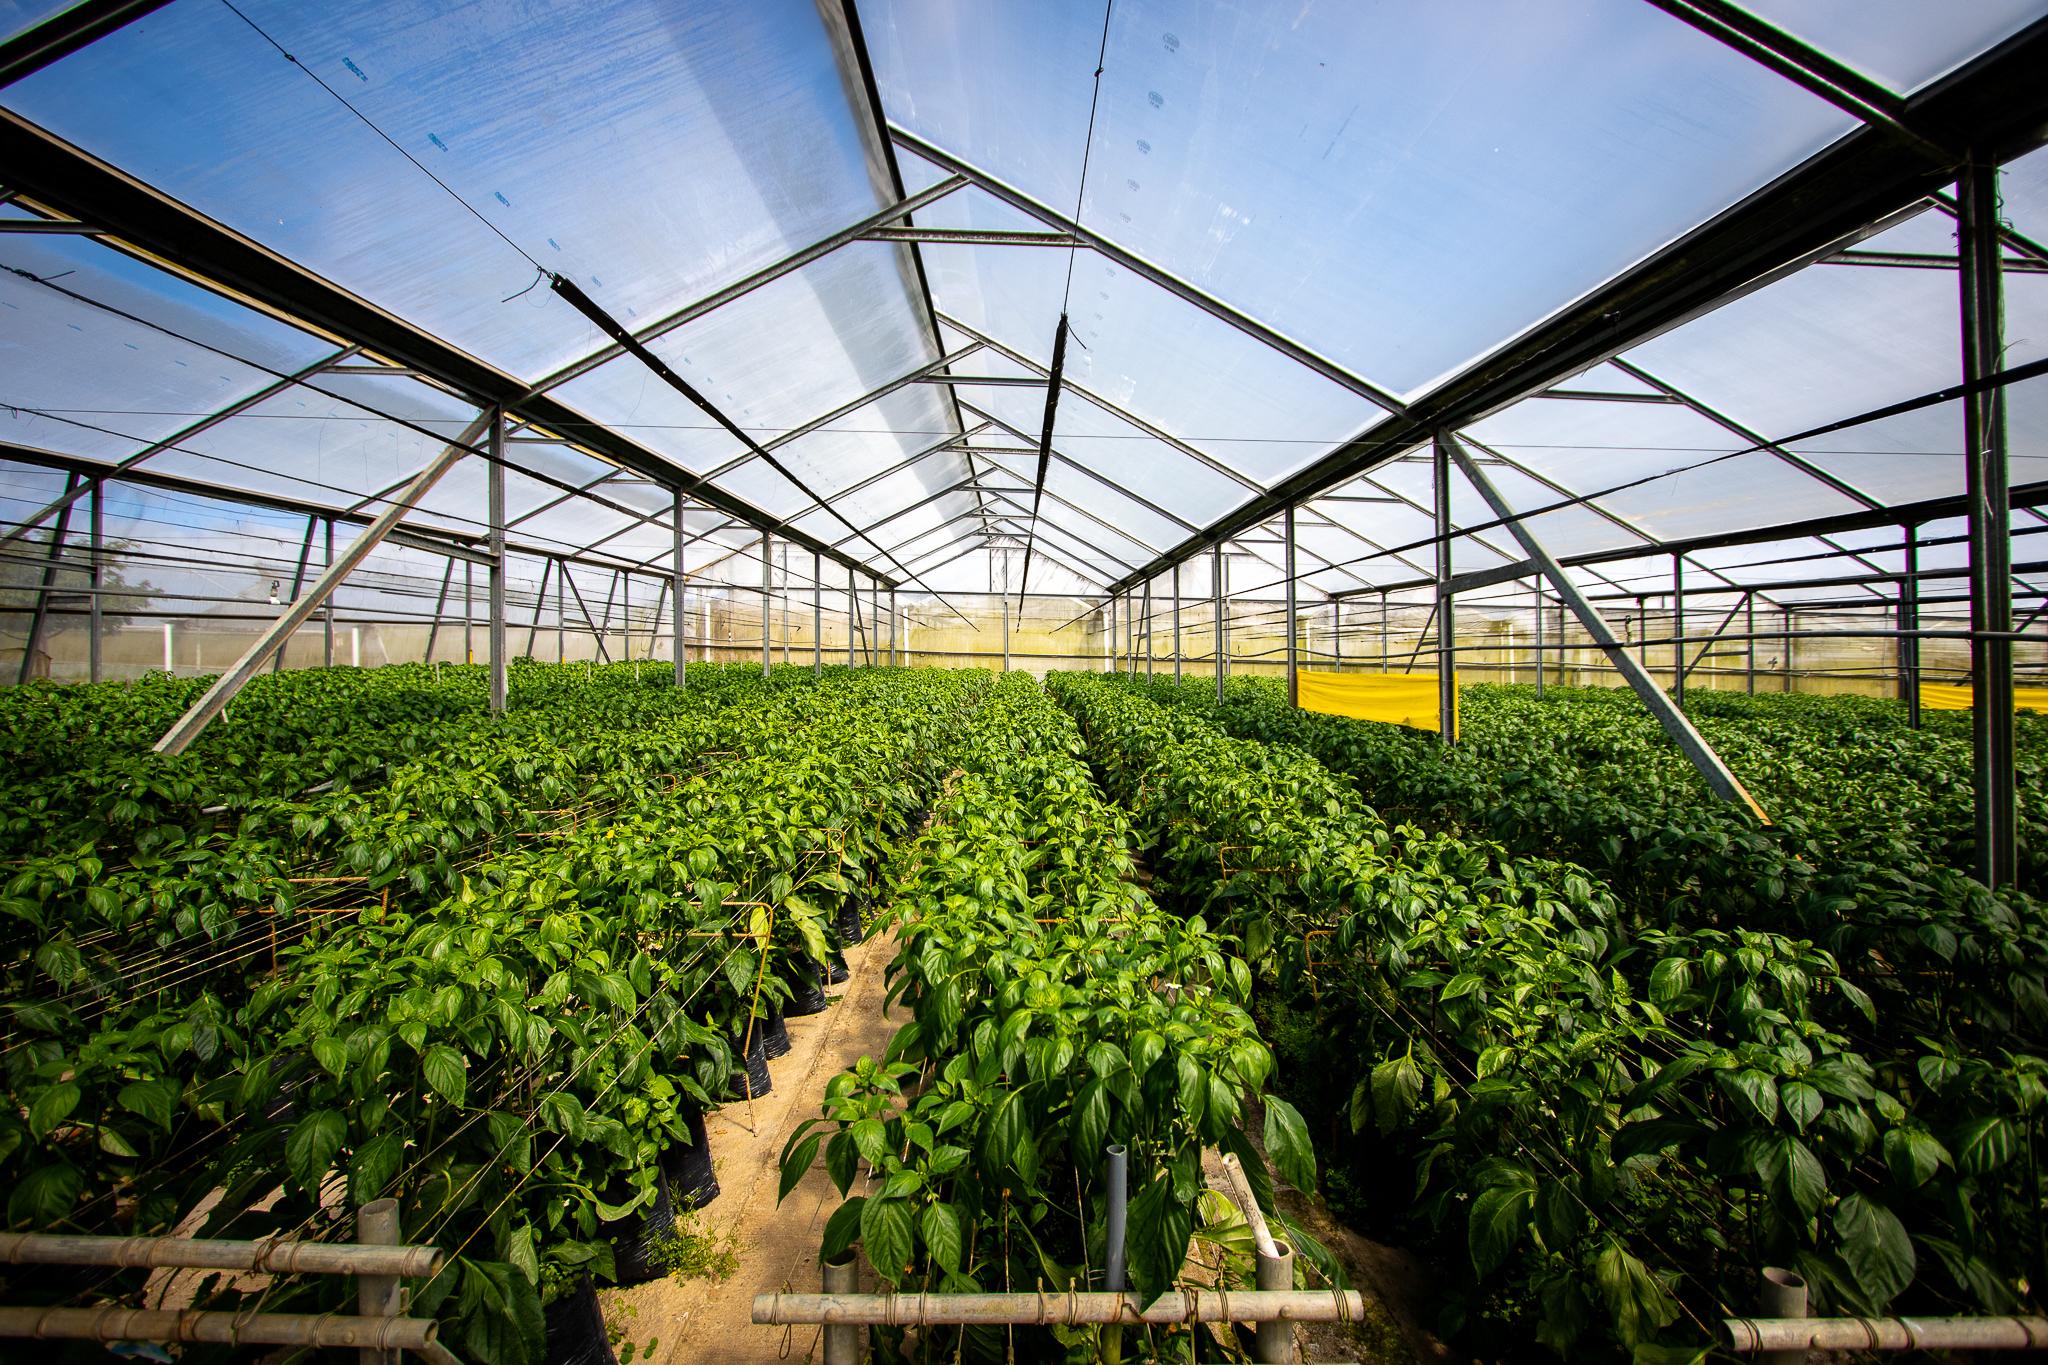 Walmart promueve cultivo bajo invernadero entre sus proveedores costarricenses